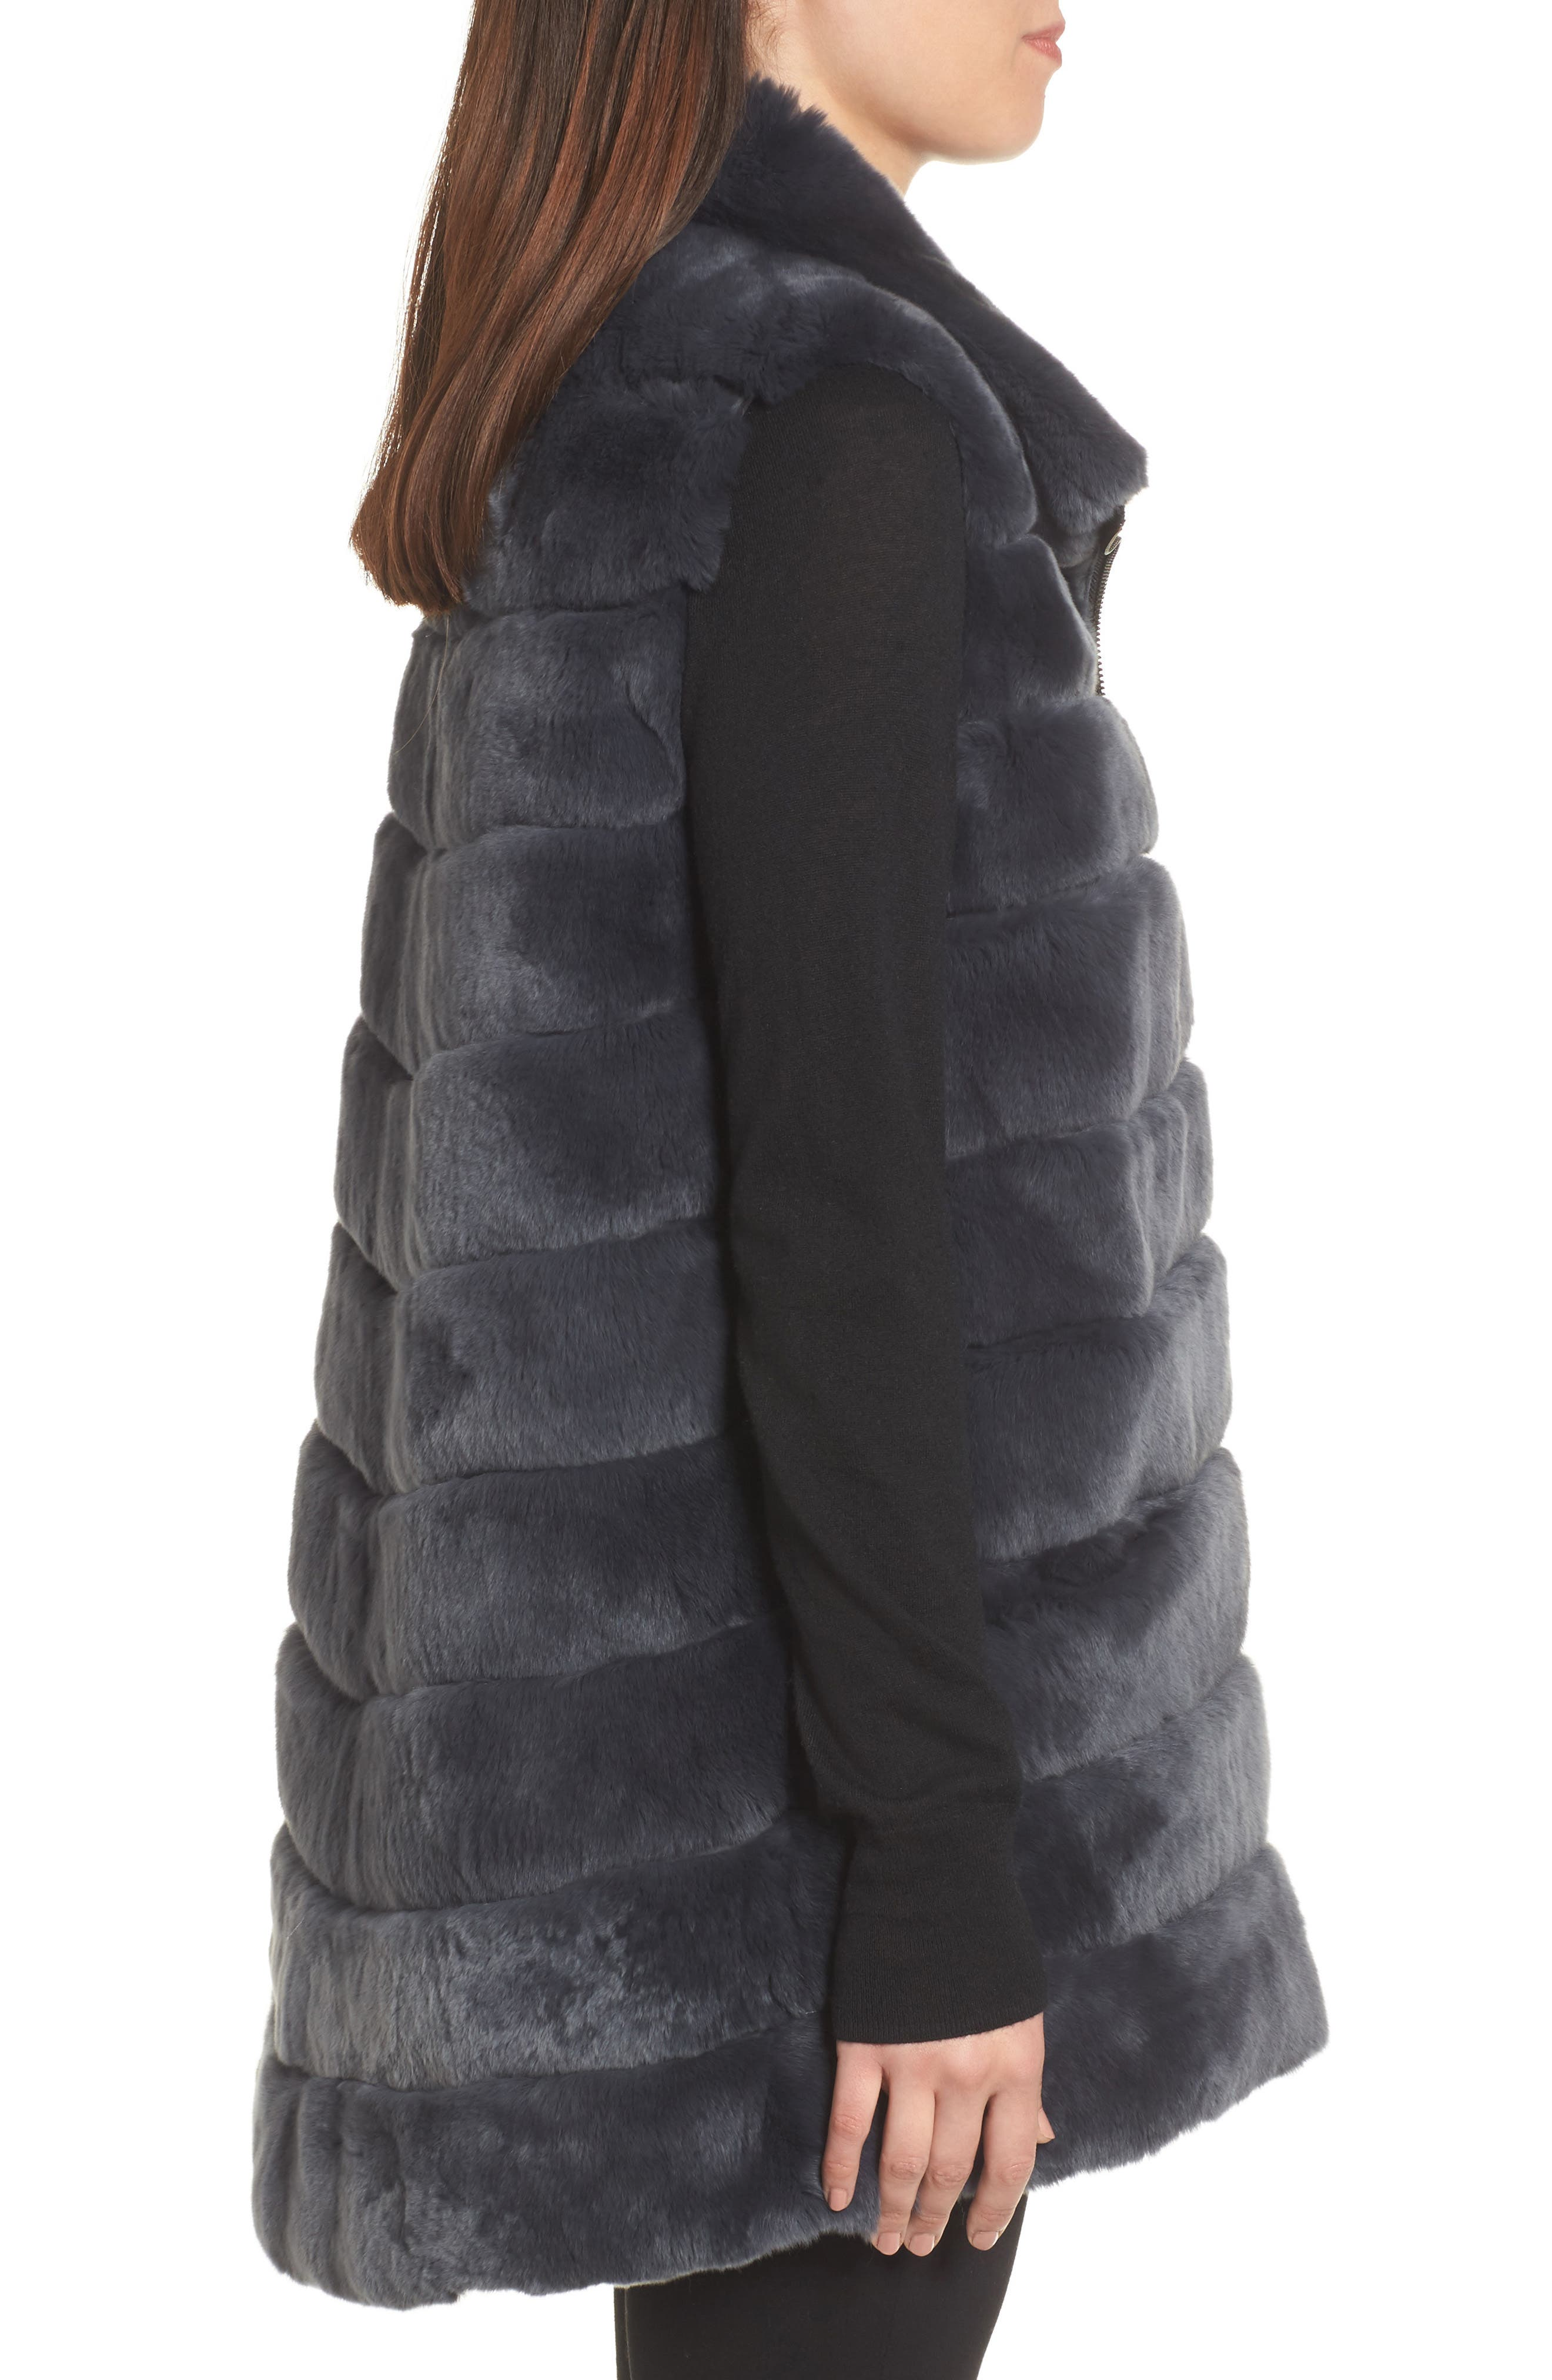 Reversible Genuine Rabbit Fur Vest,                             Alternate thumbnail 3, color,                             410